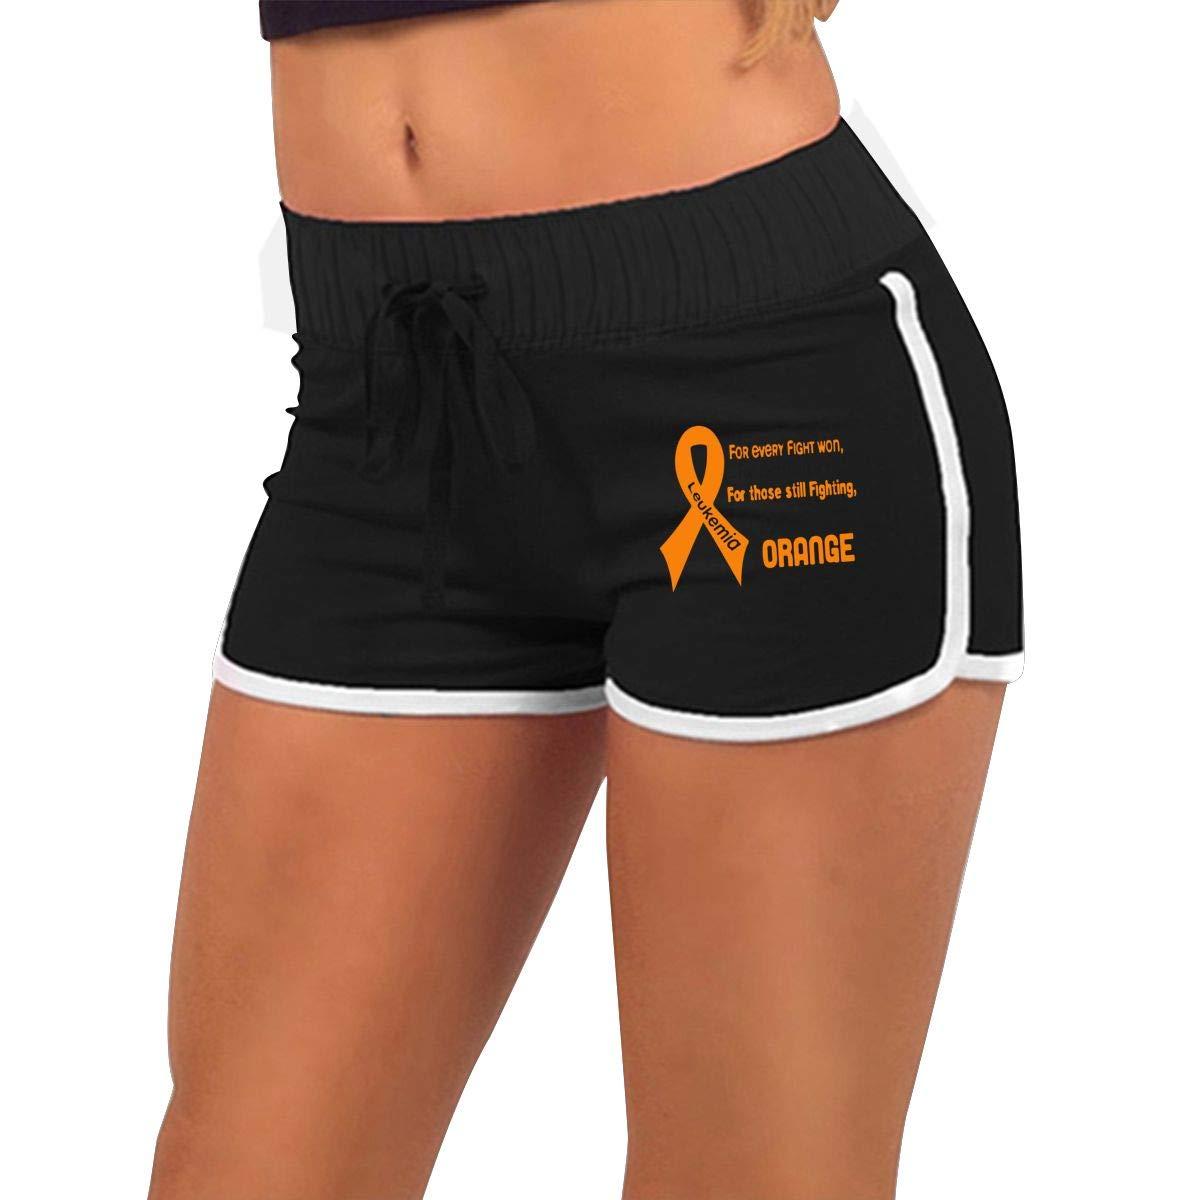 Qo84Il/& Womens Casual Beach Shorts Low Waist Leukemia Awareness Shorts